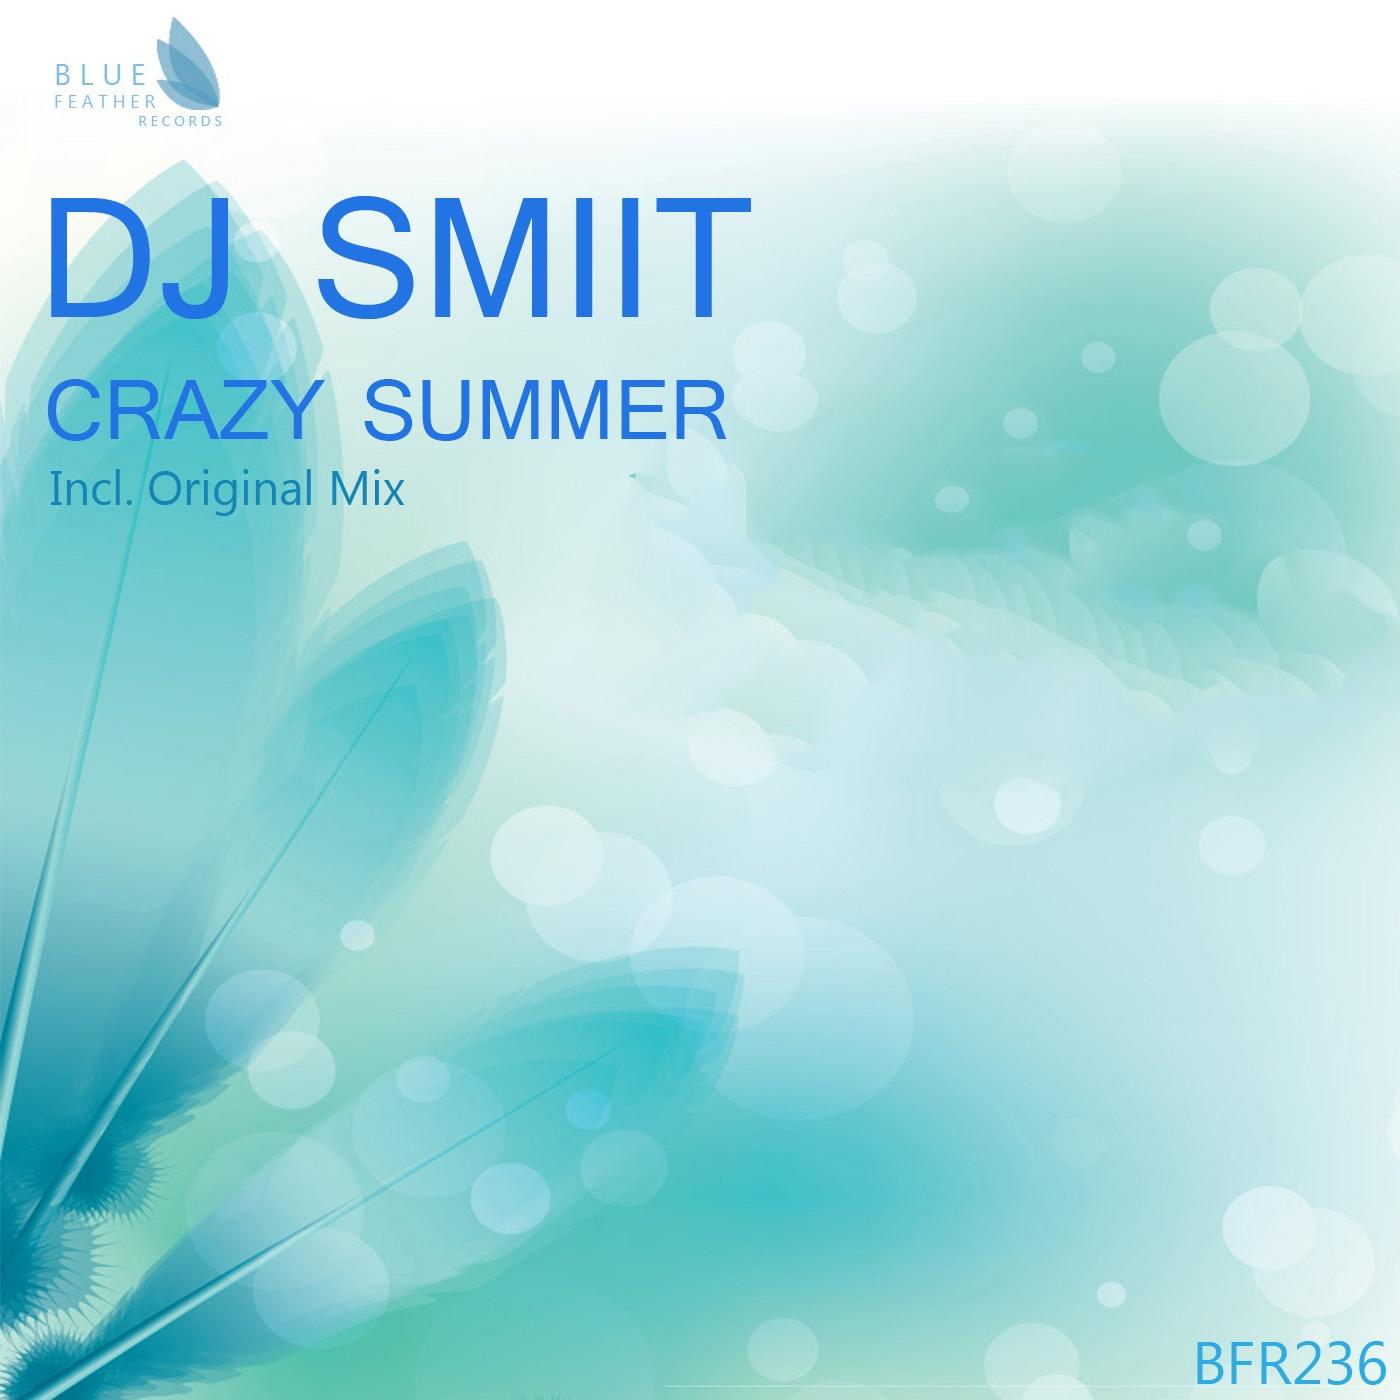 Dj Smiit - Crazy Summer (Original Mix)